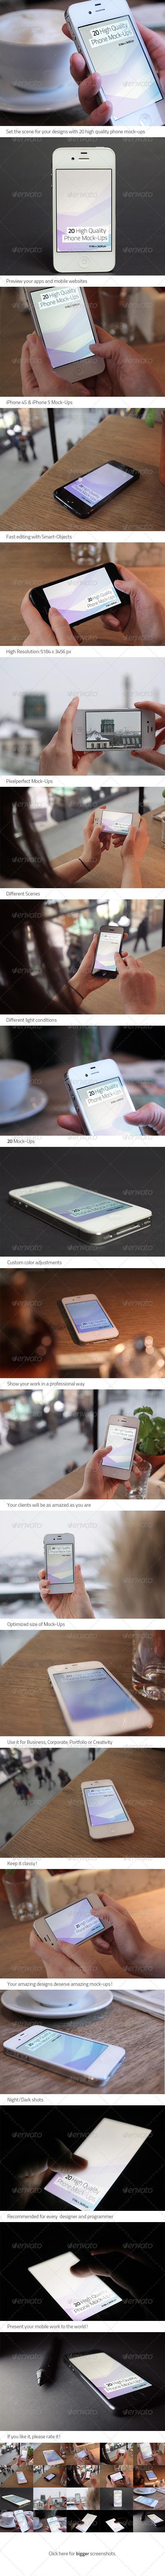 GraphicRiver 20 High Quality Phone Mock-Ups 4245823